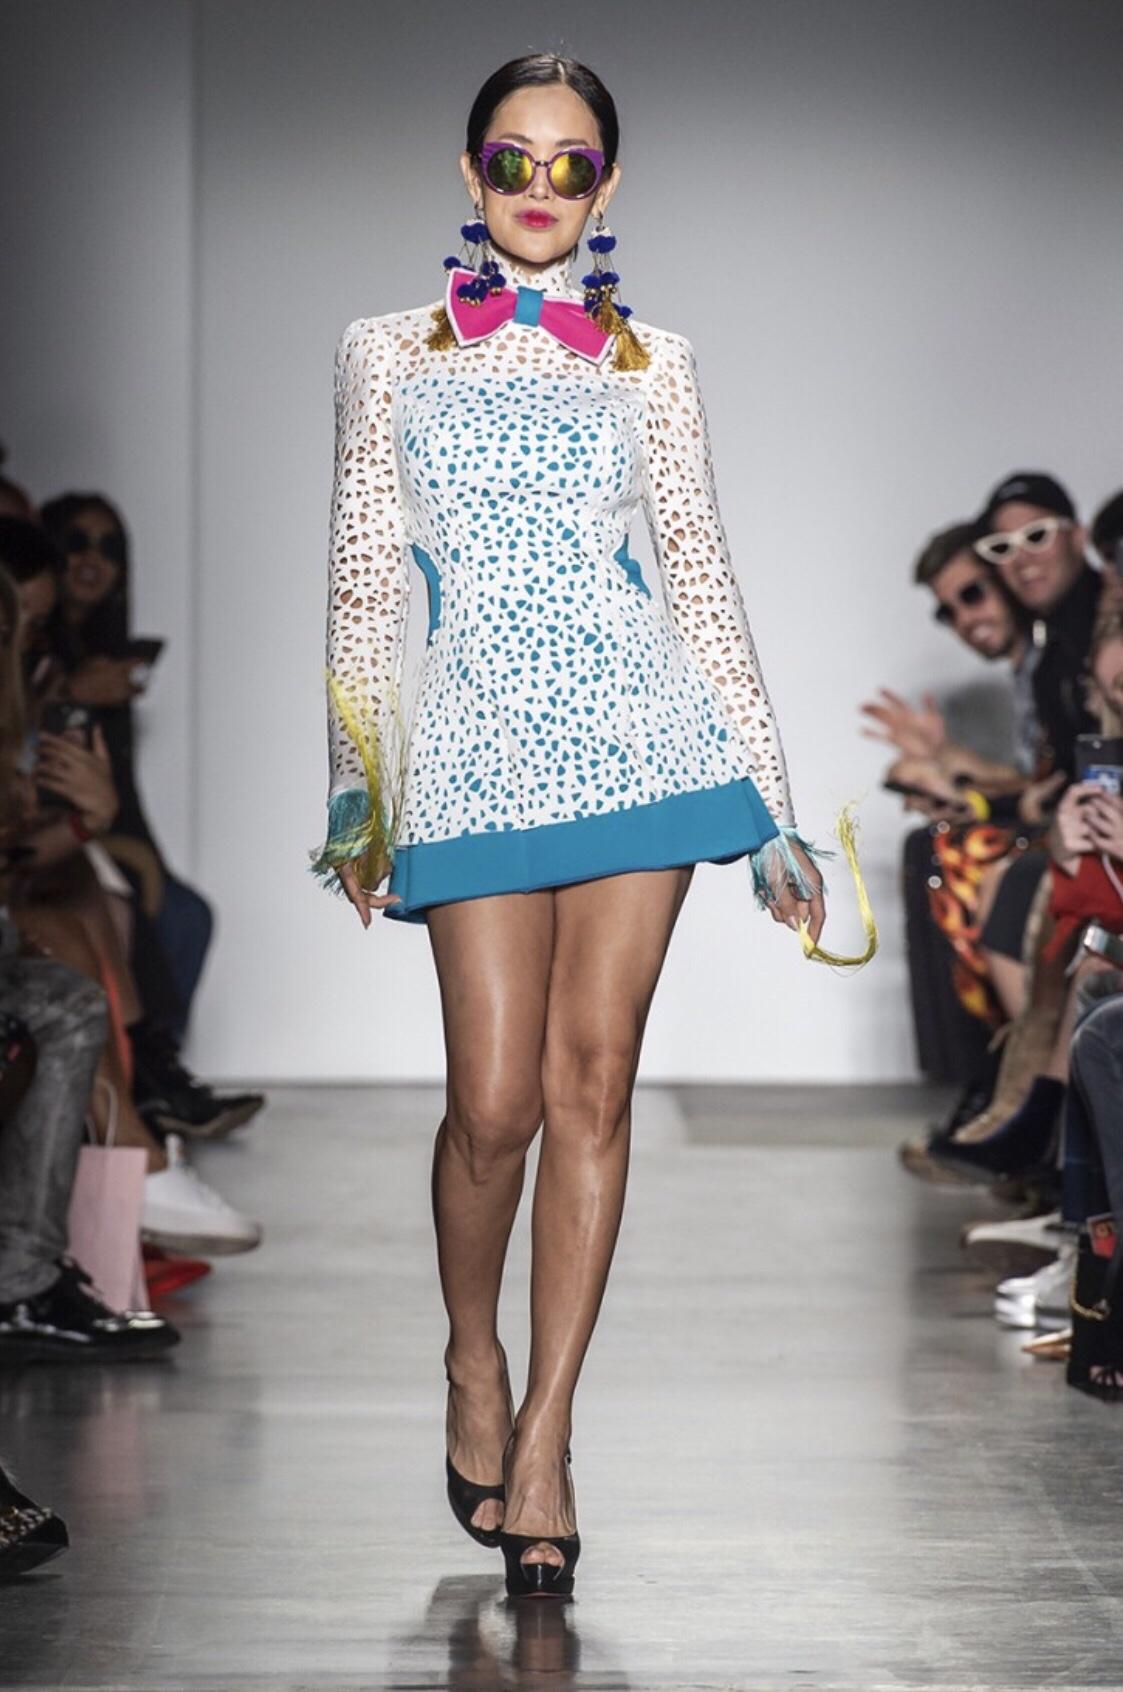 New York Fashion Week SS2019